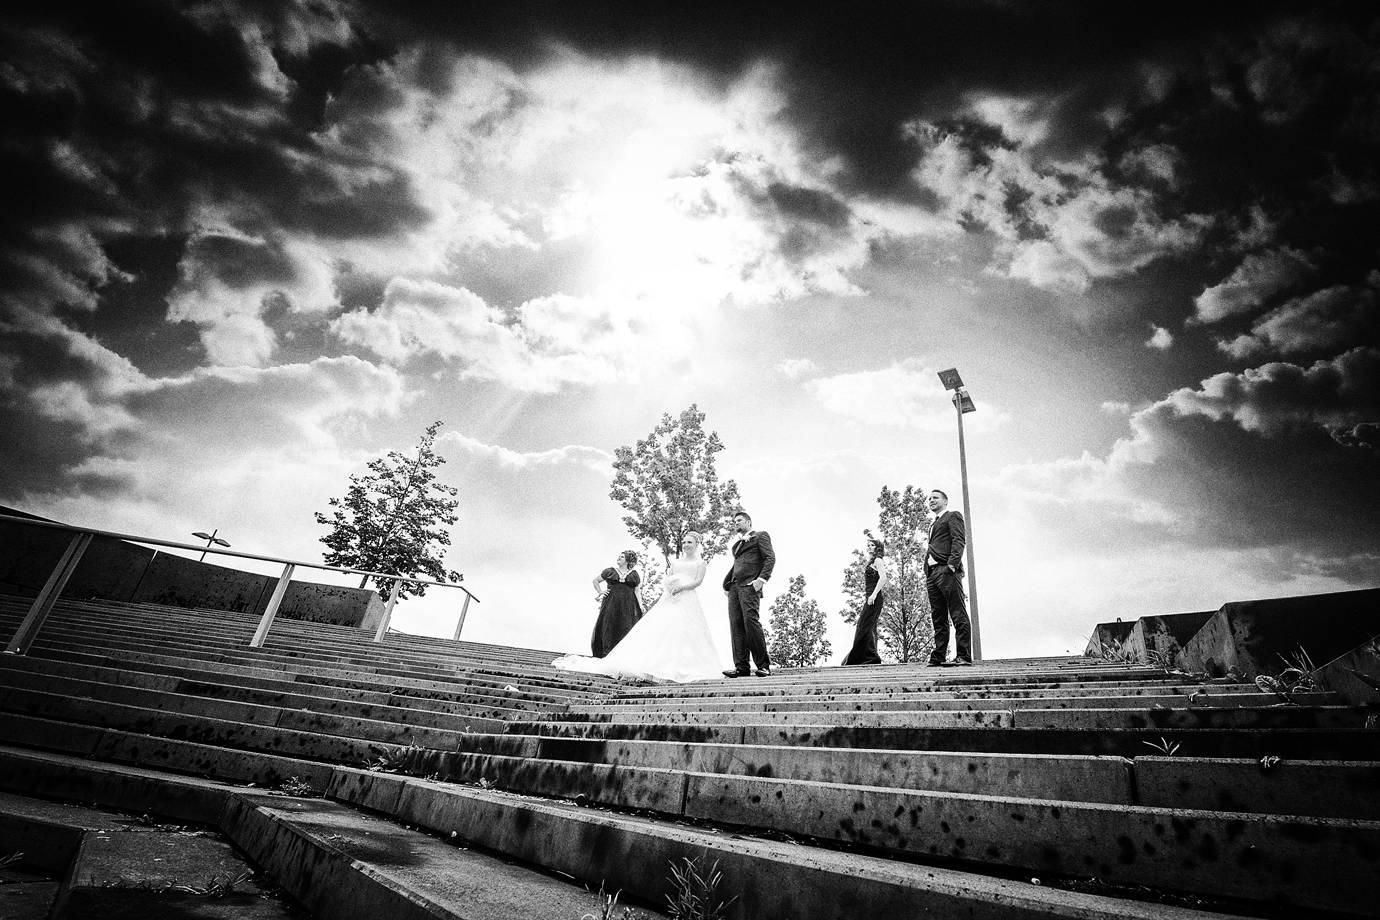 hochzeitsfotograf bremen 06 - Betül+Asad